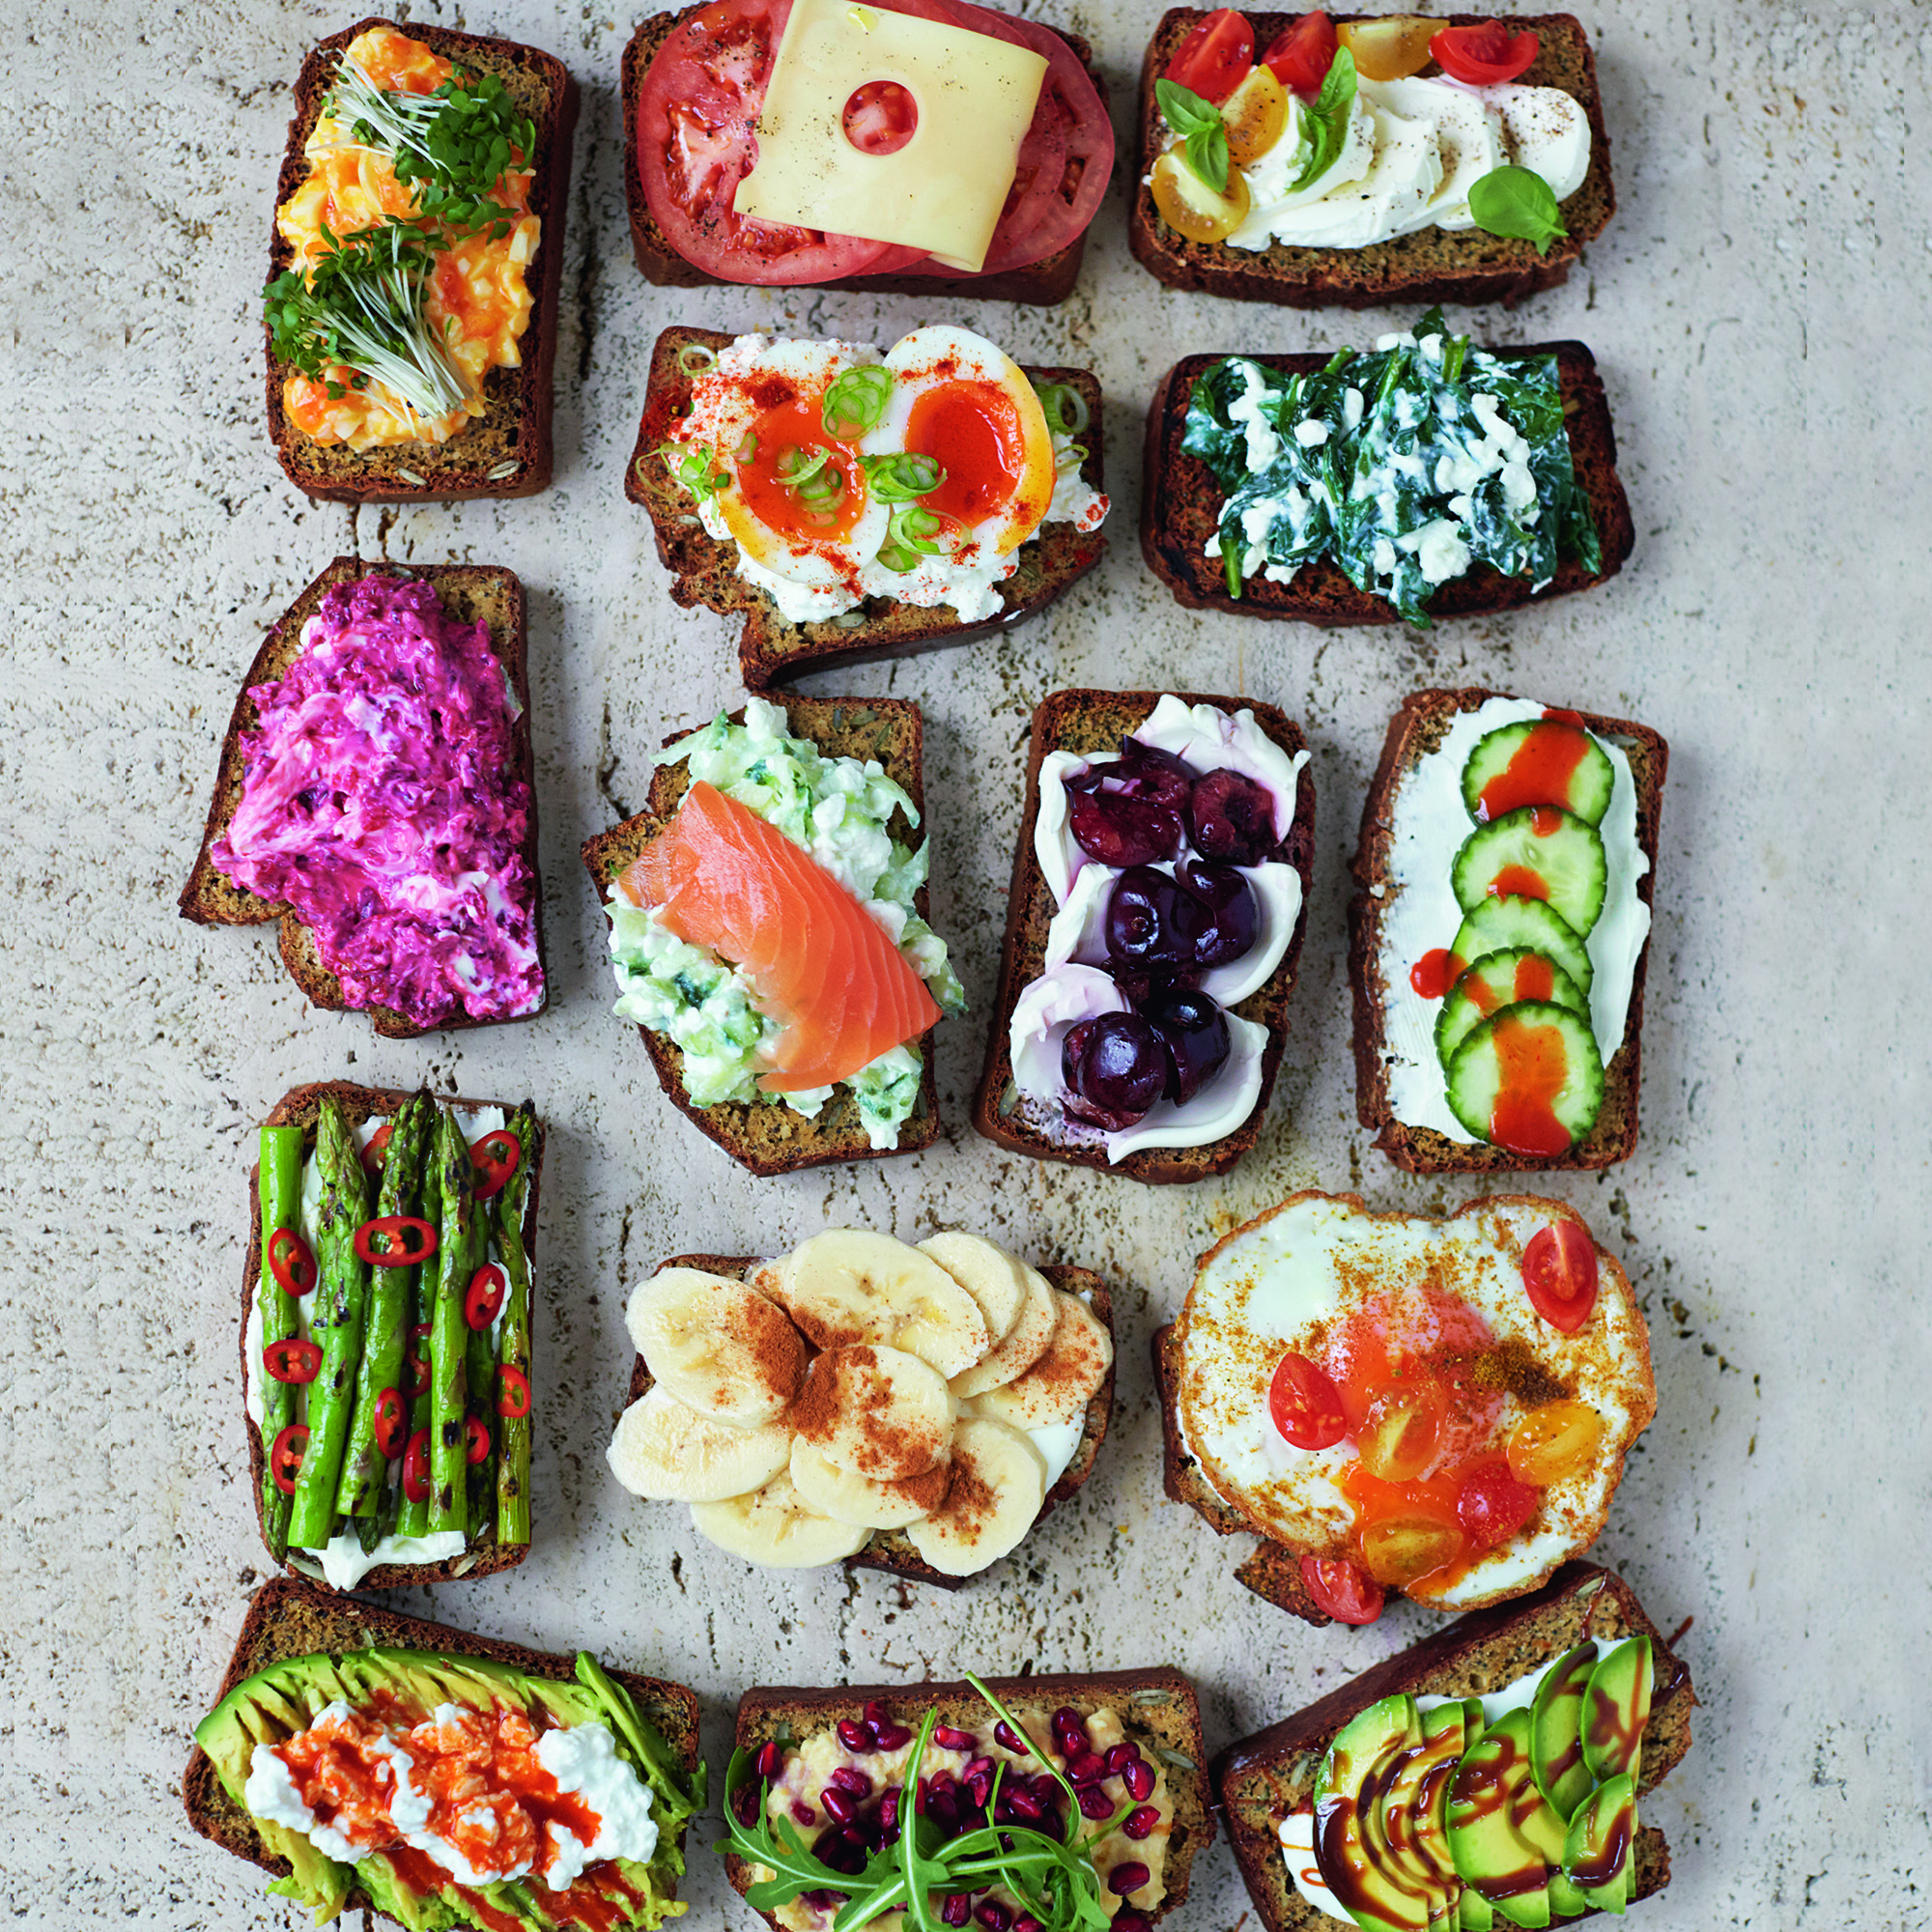 jamie oliver 39 s super food protein loaf woman and home. Black Bedroom Furniture Sets. Home Design Ideas